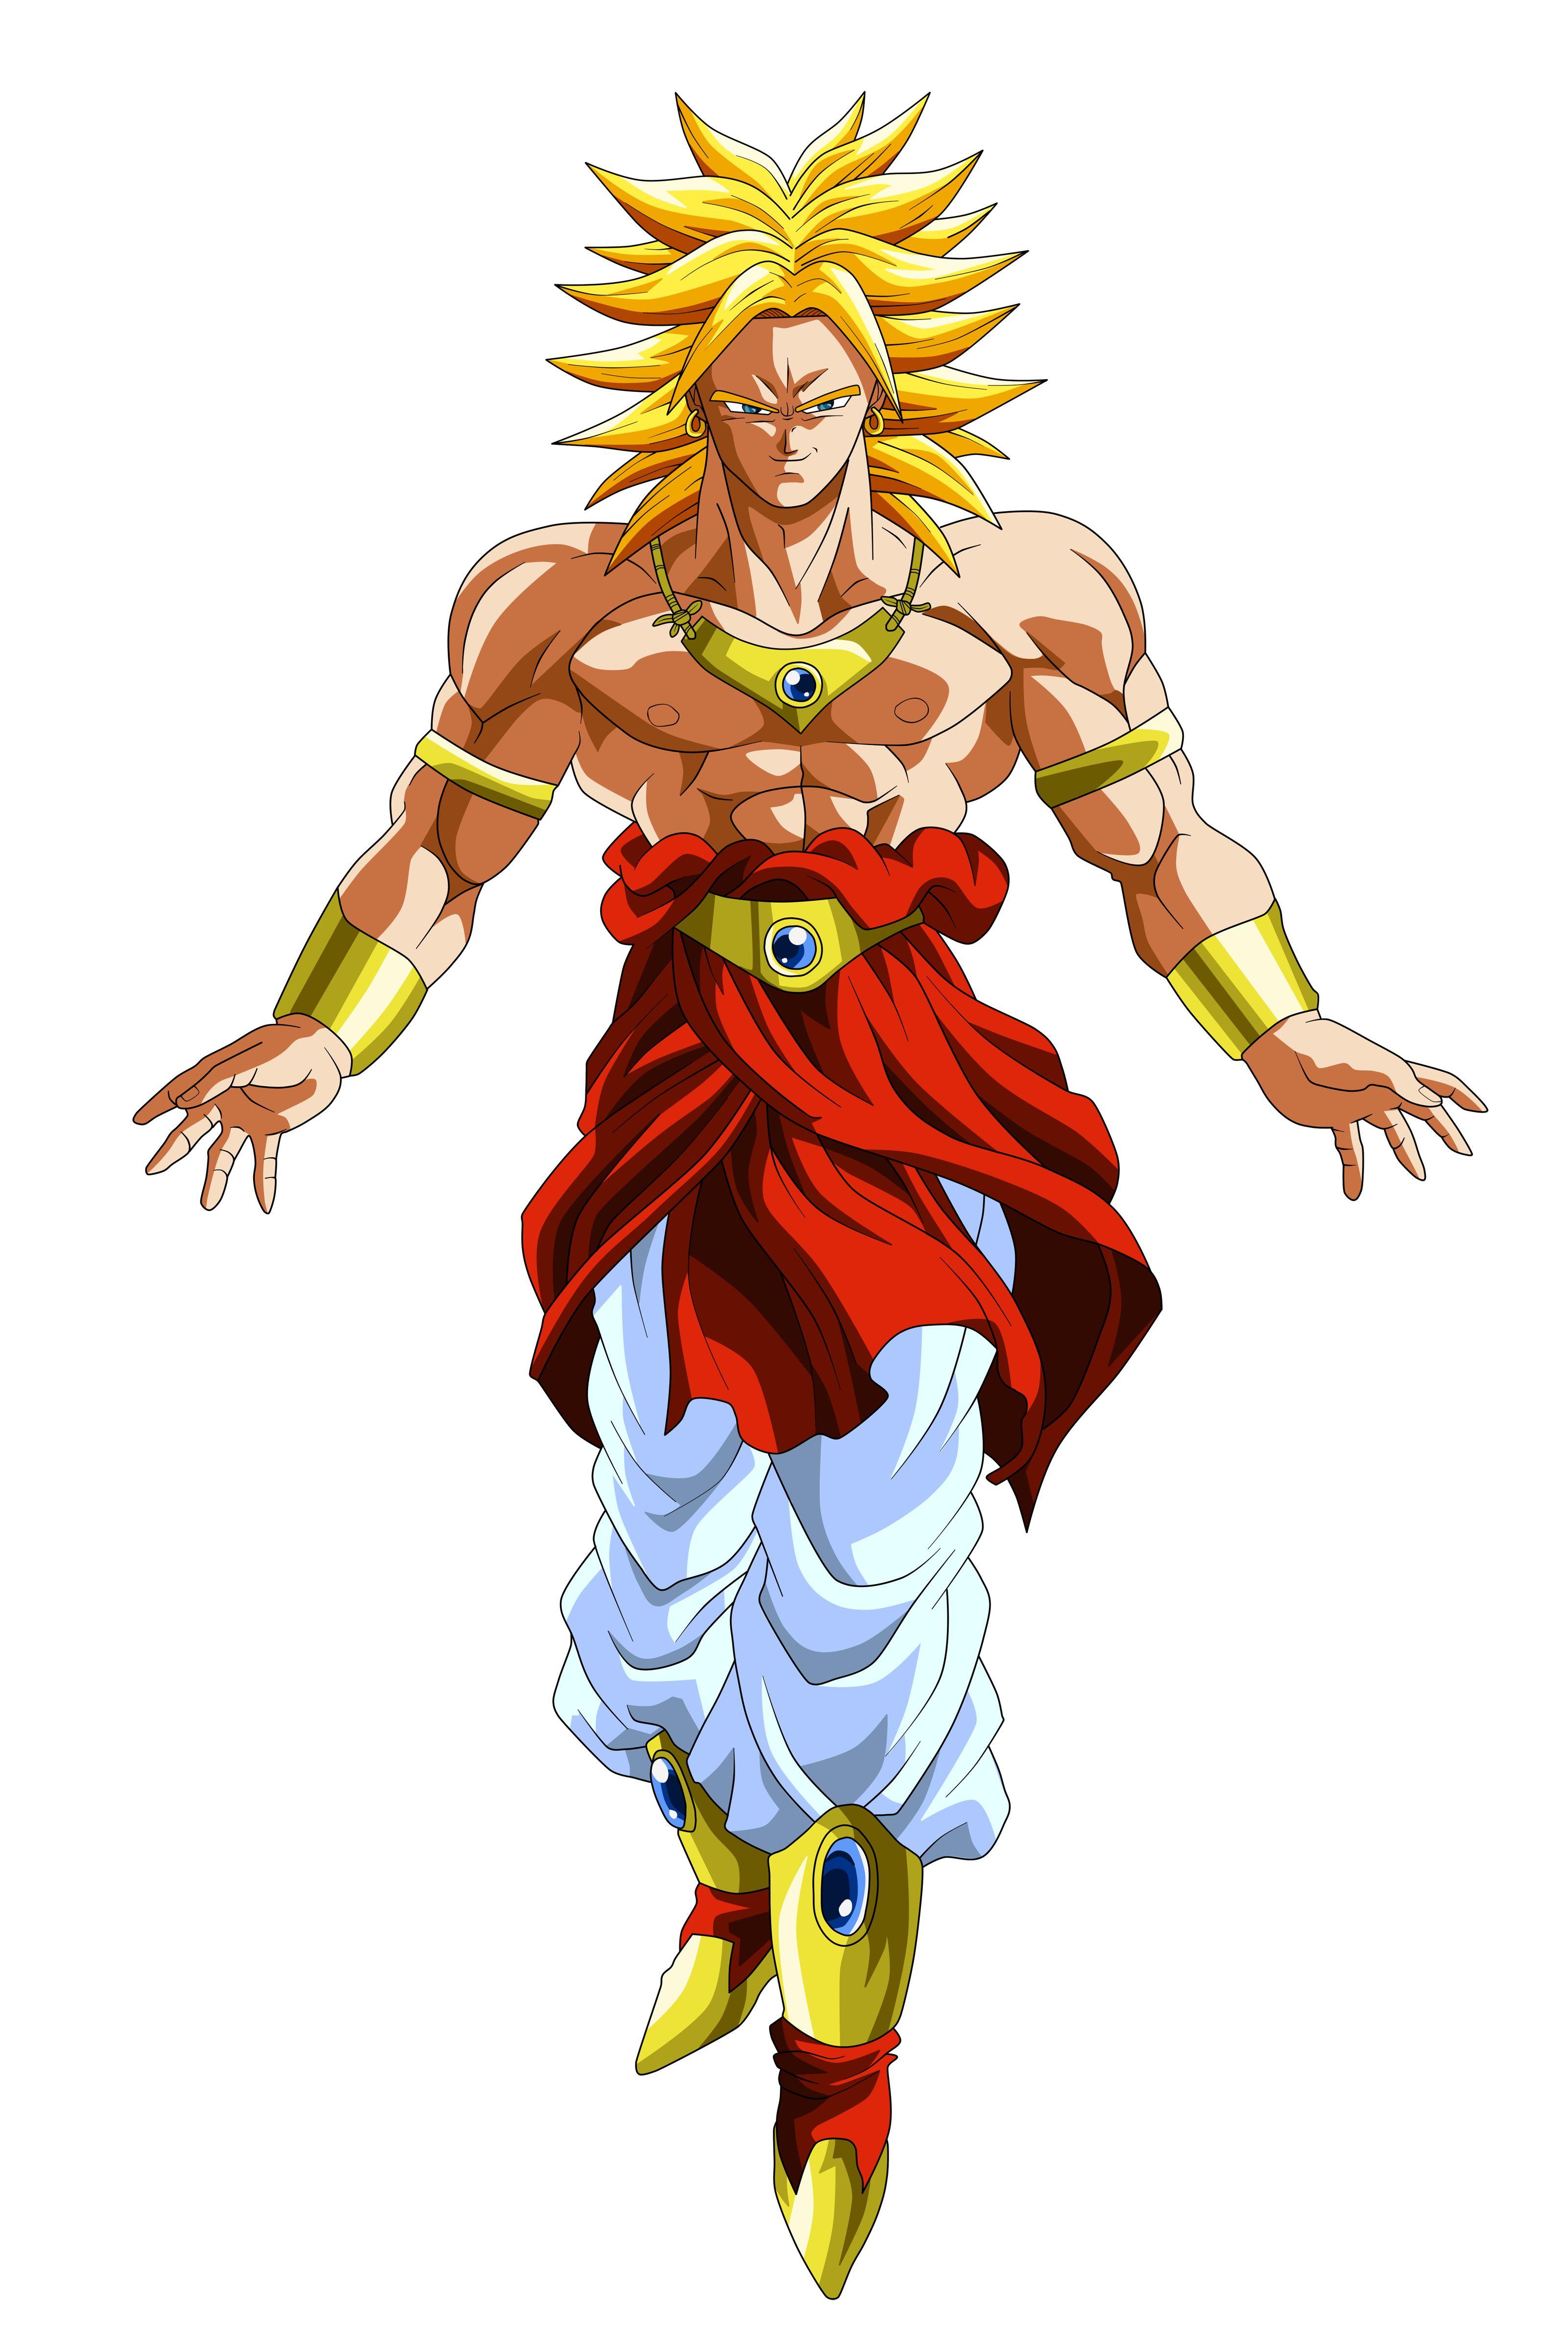 Broly Legendary Super Saiyan Broly Super Saiyan Anime Dragon Ball Super Dragon Ball Super